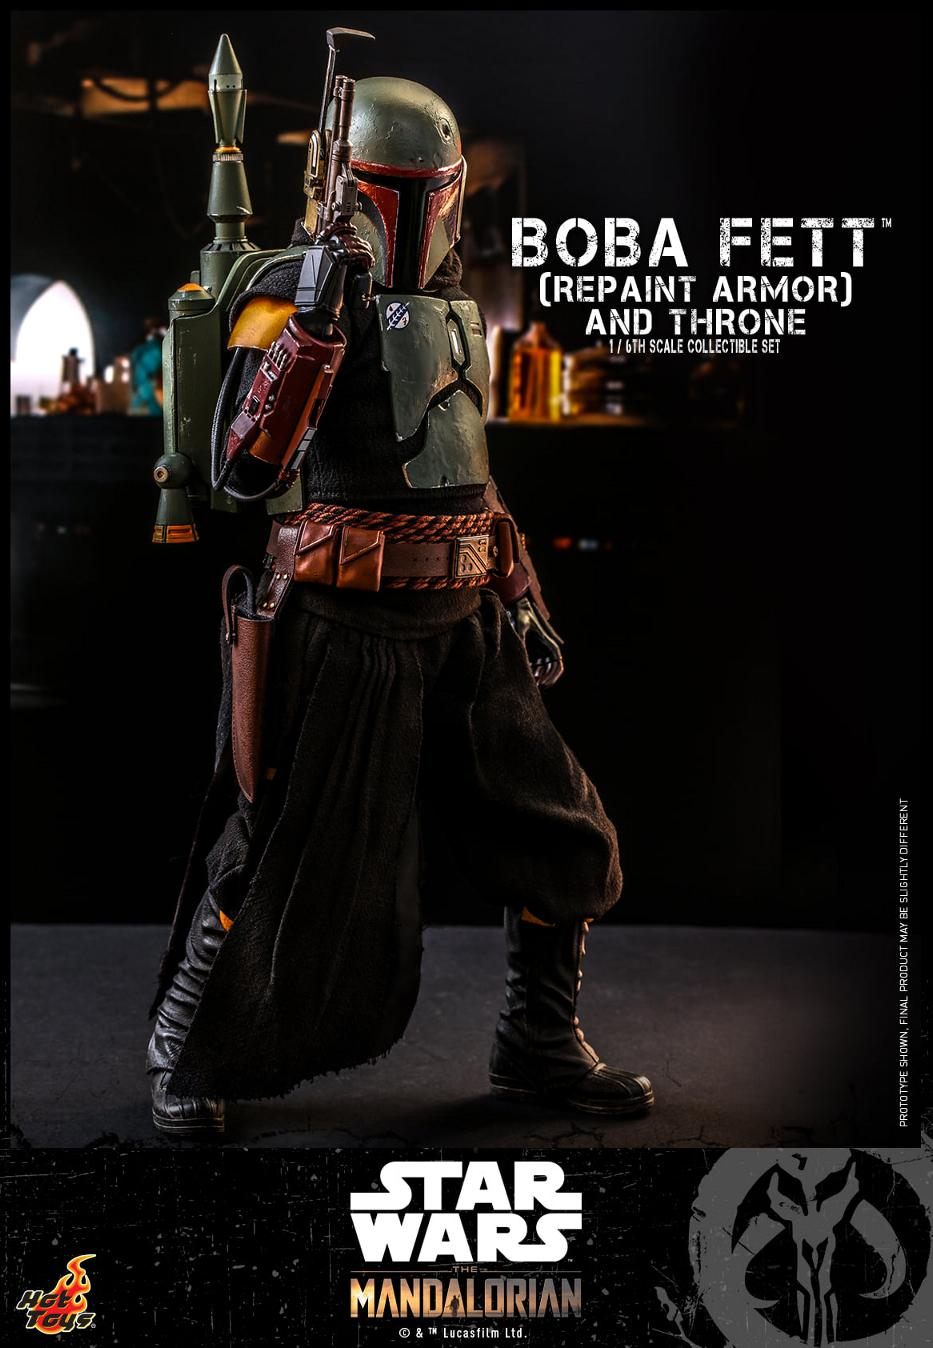 Boba Fett (Repaint Armor) & Throne Collectible Set Hot Toys Boba_f49